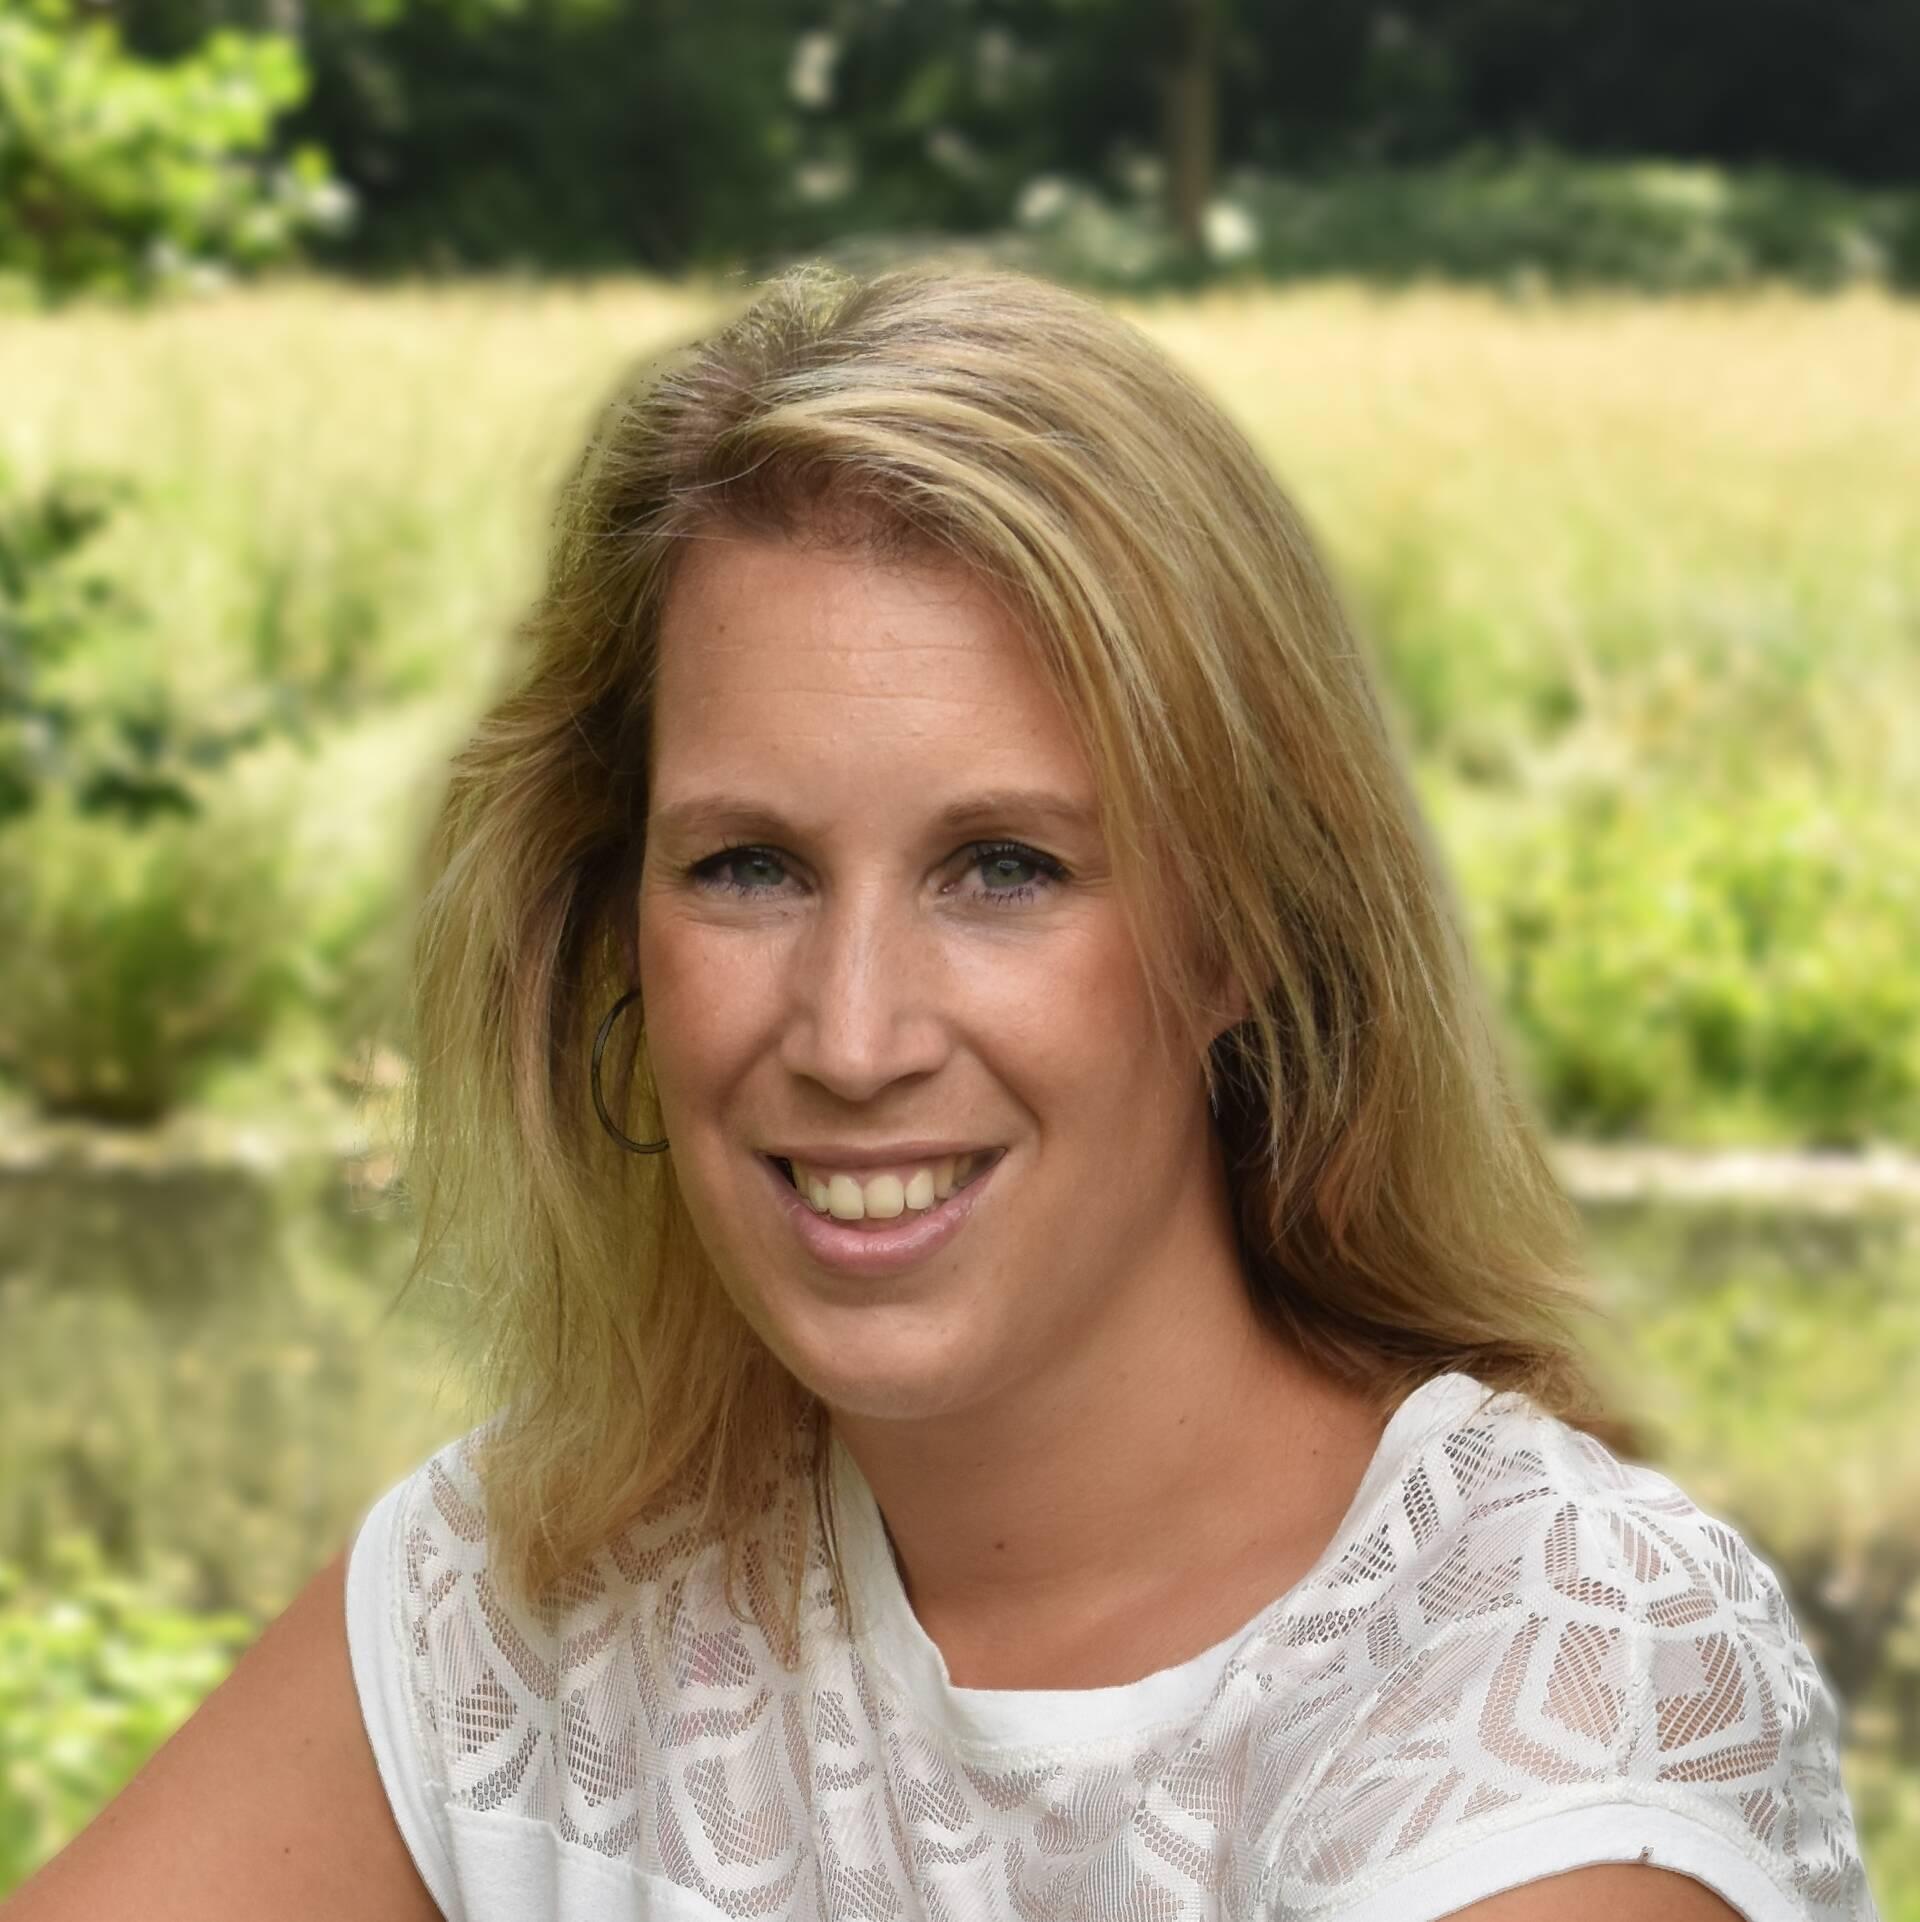 Jeanine van Nistelrooij - Knipping